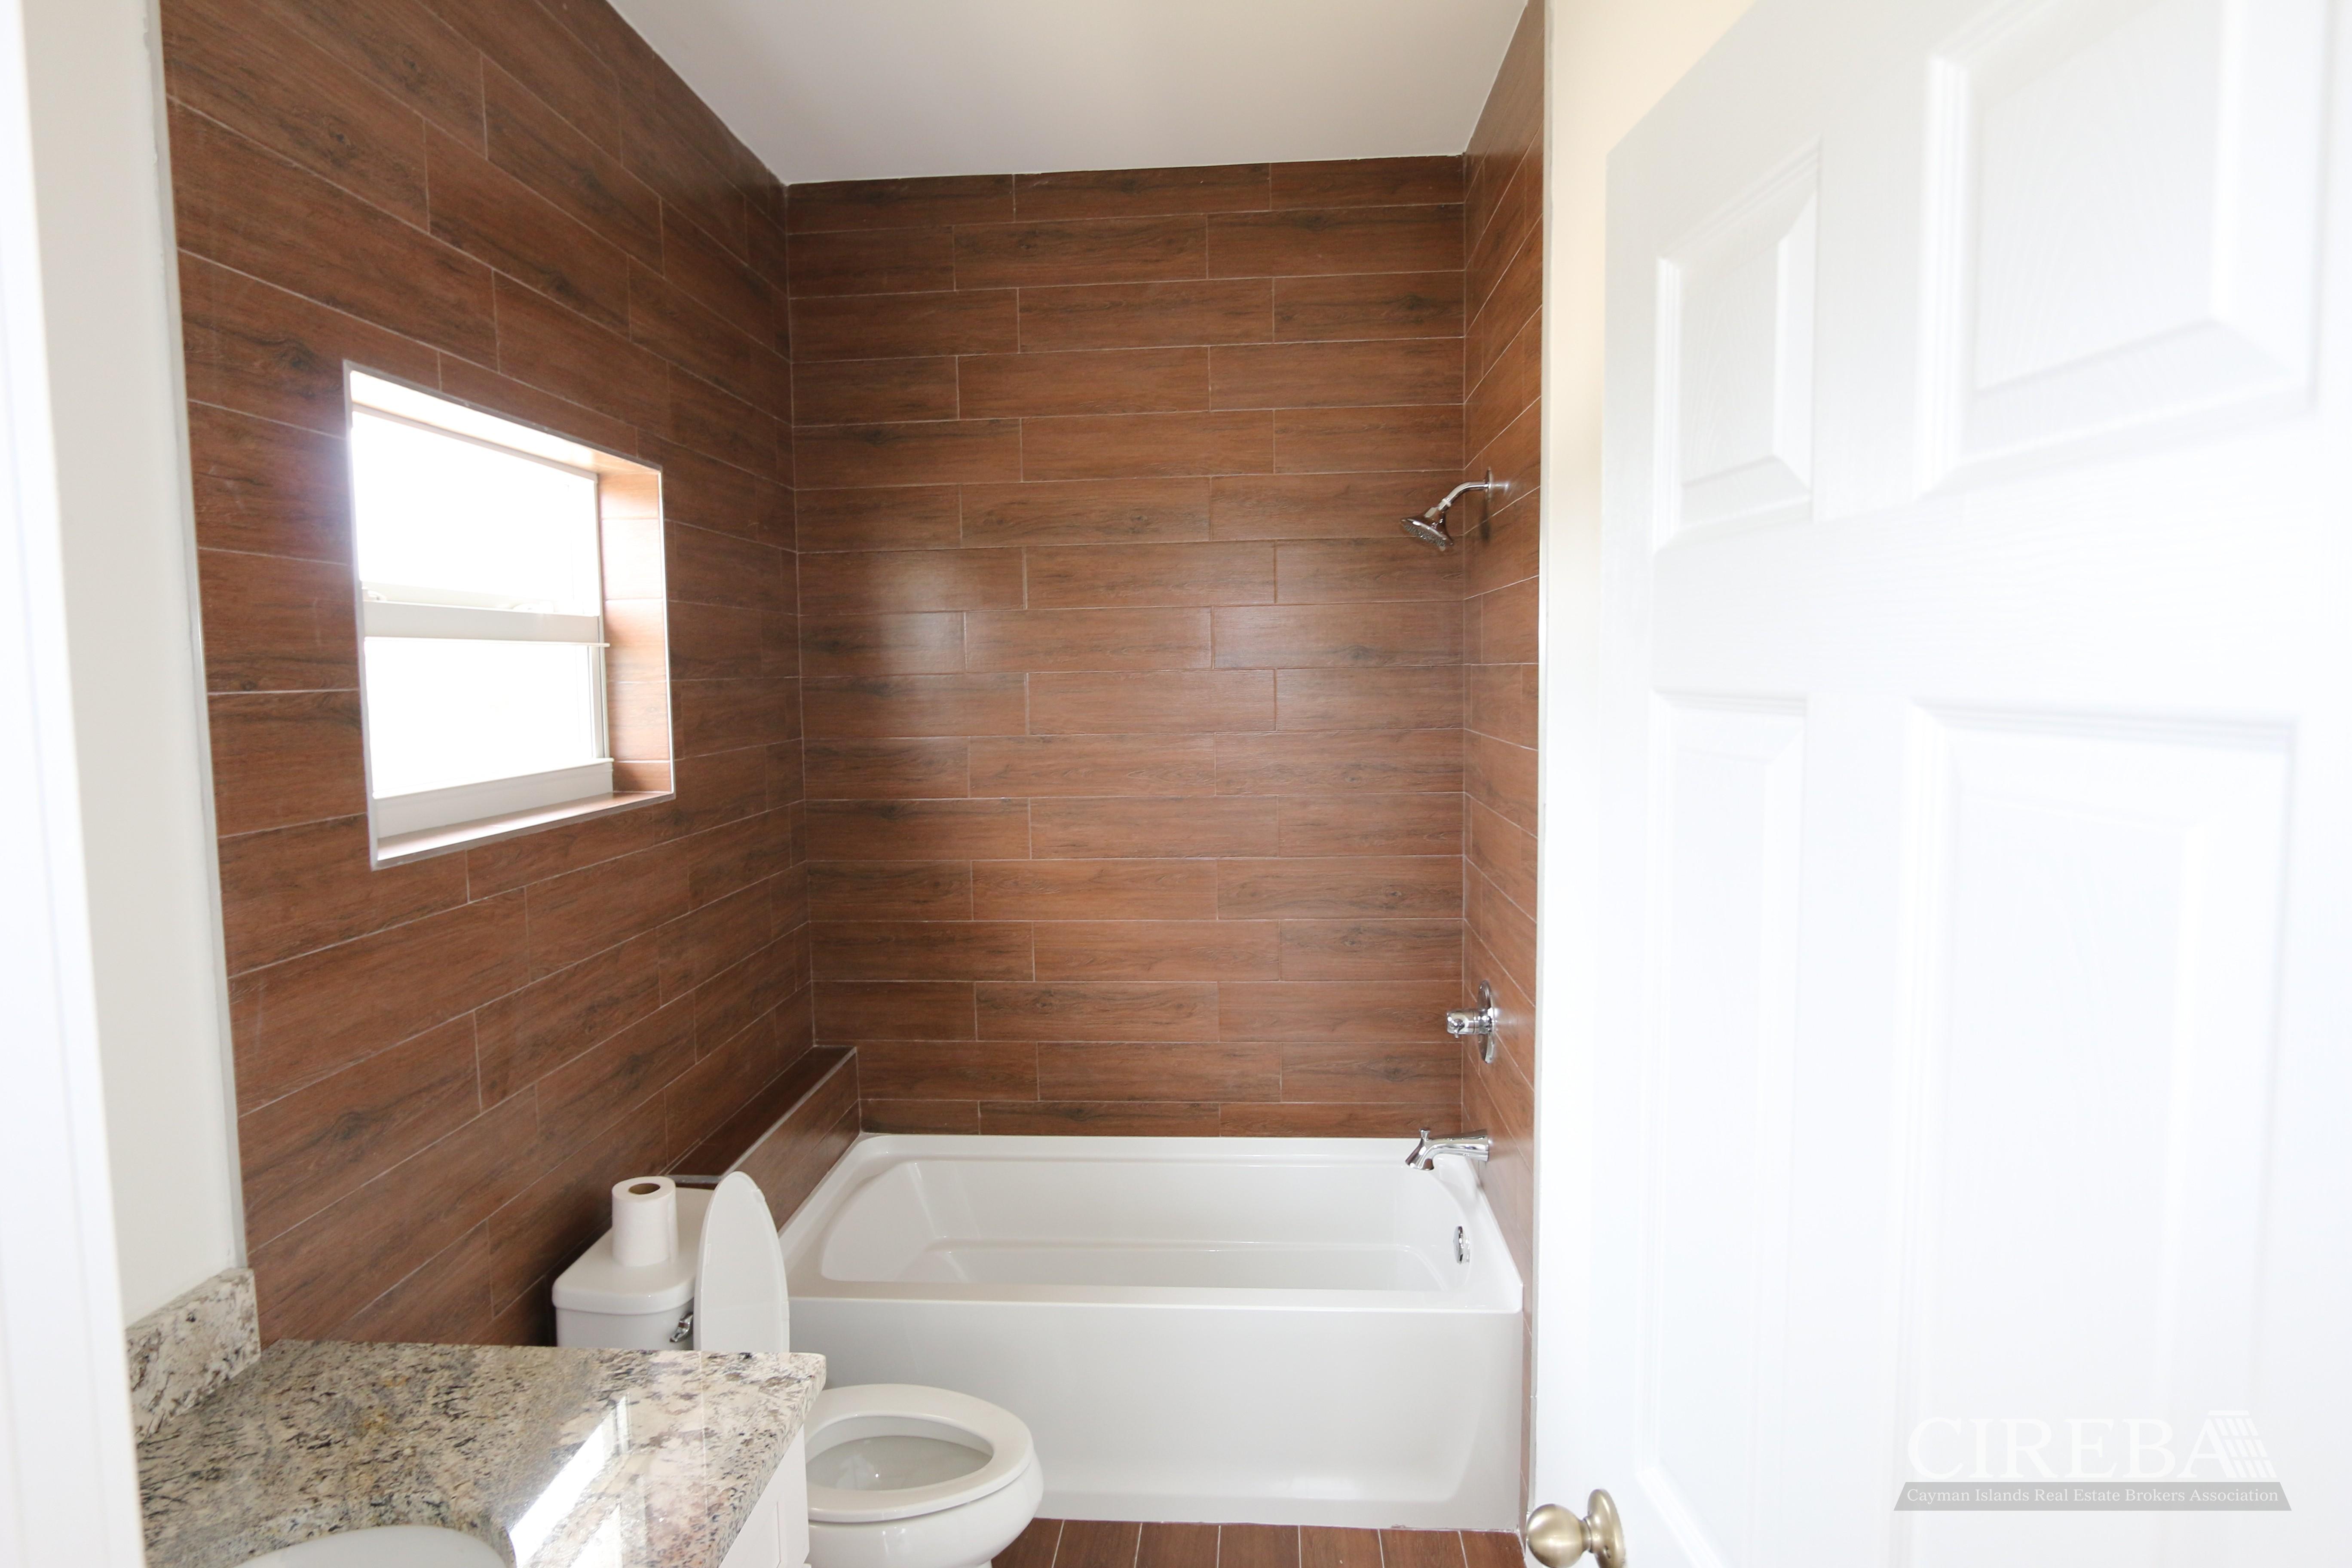 LOOKOUT GARDENS - PRE-CONSTRUCTION - 2 BEDROOM UNIT #1